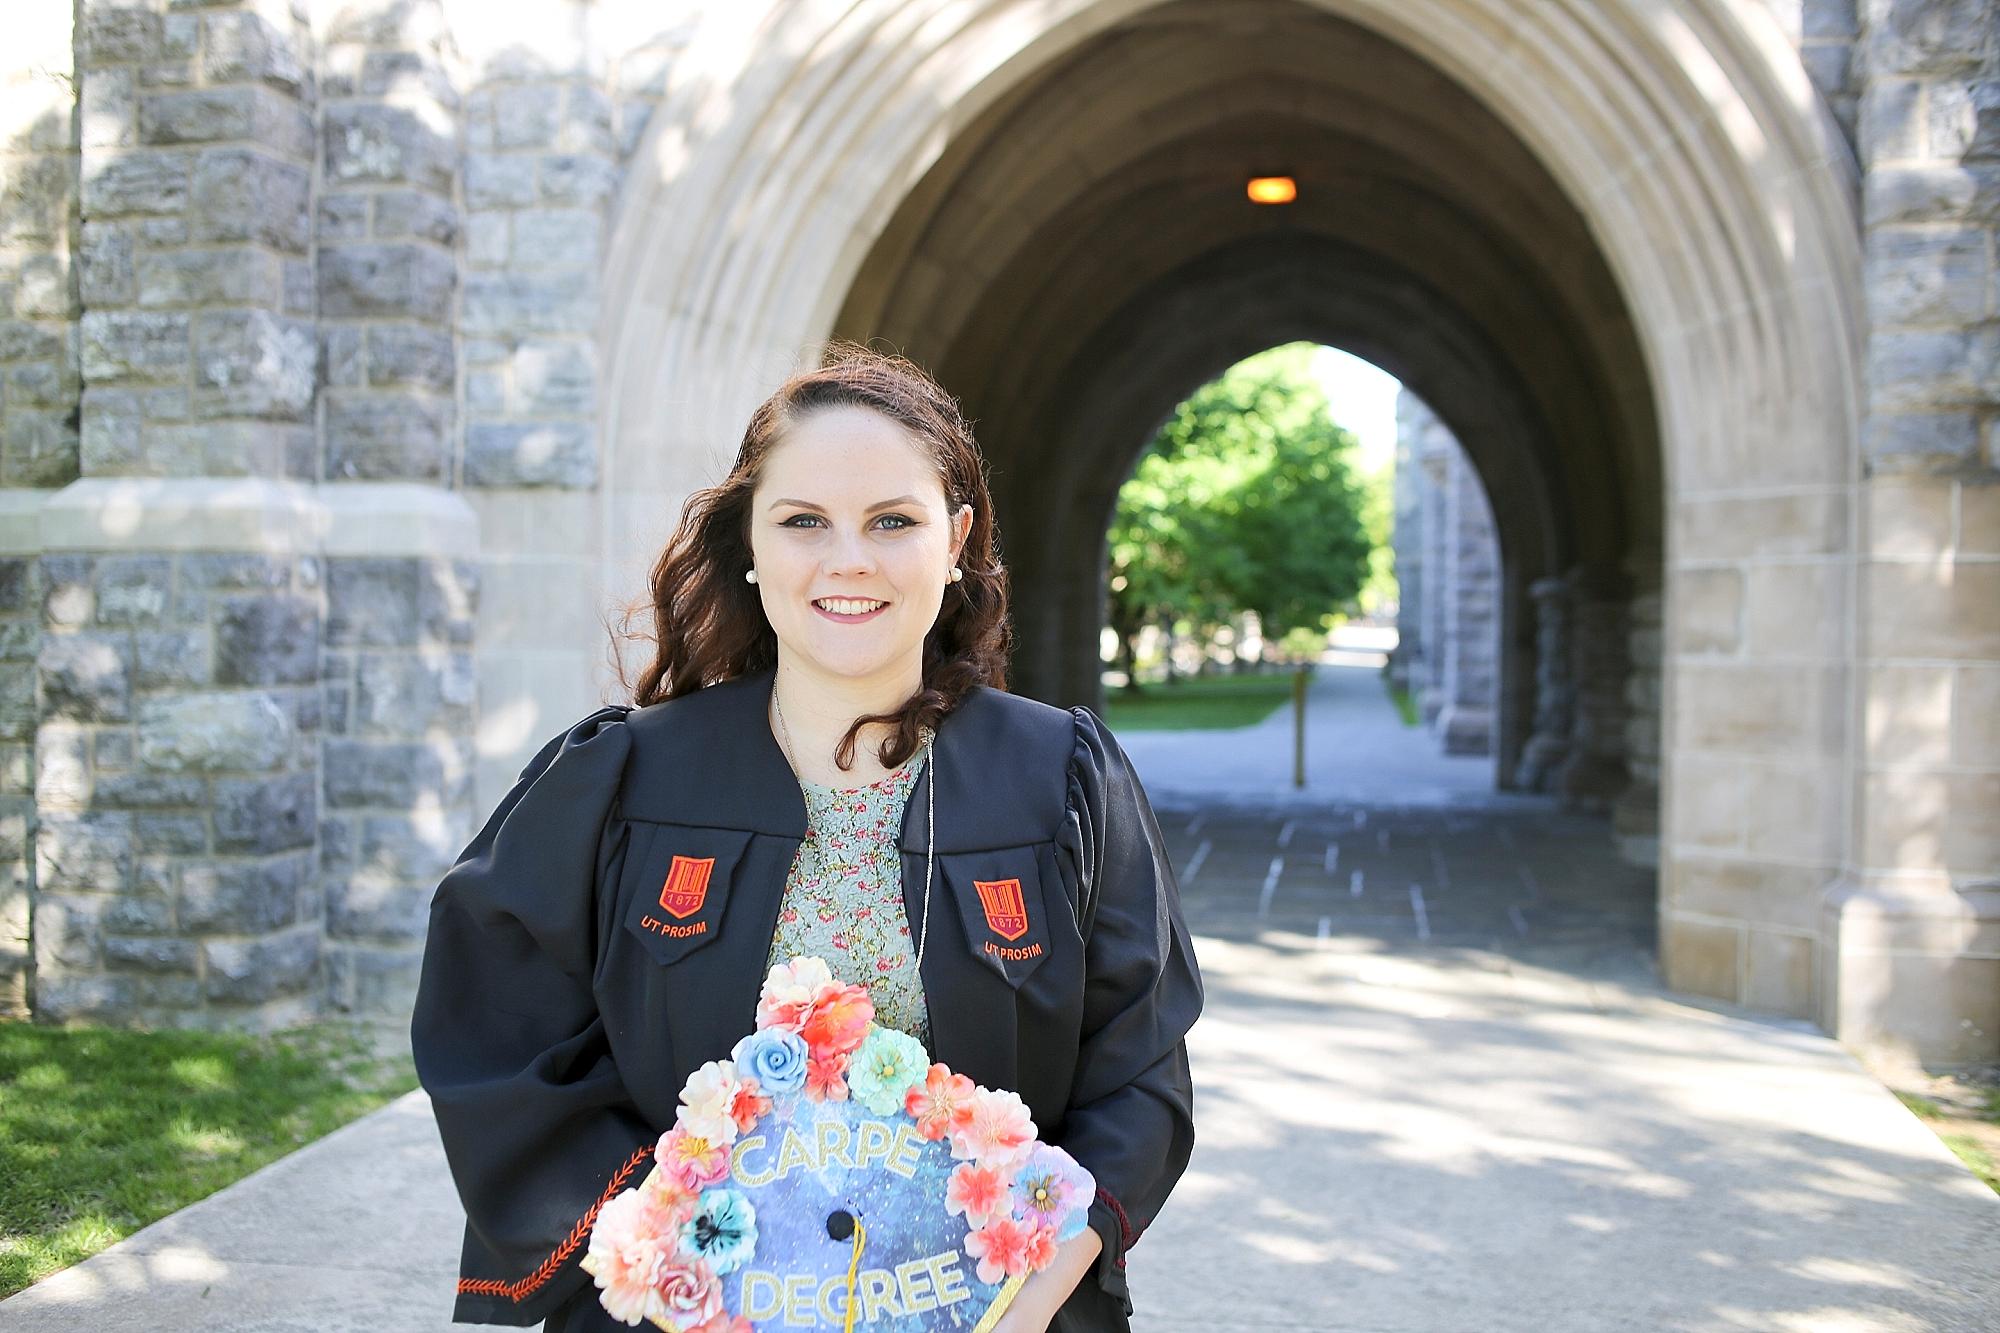 Rebecca | Virginia Tech Graduation Portrait Photographer, Holly Cromer